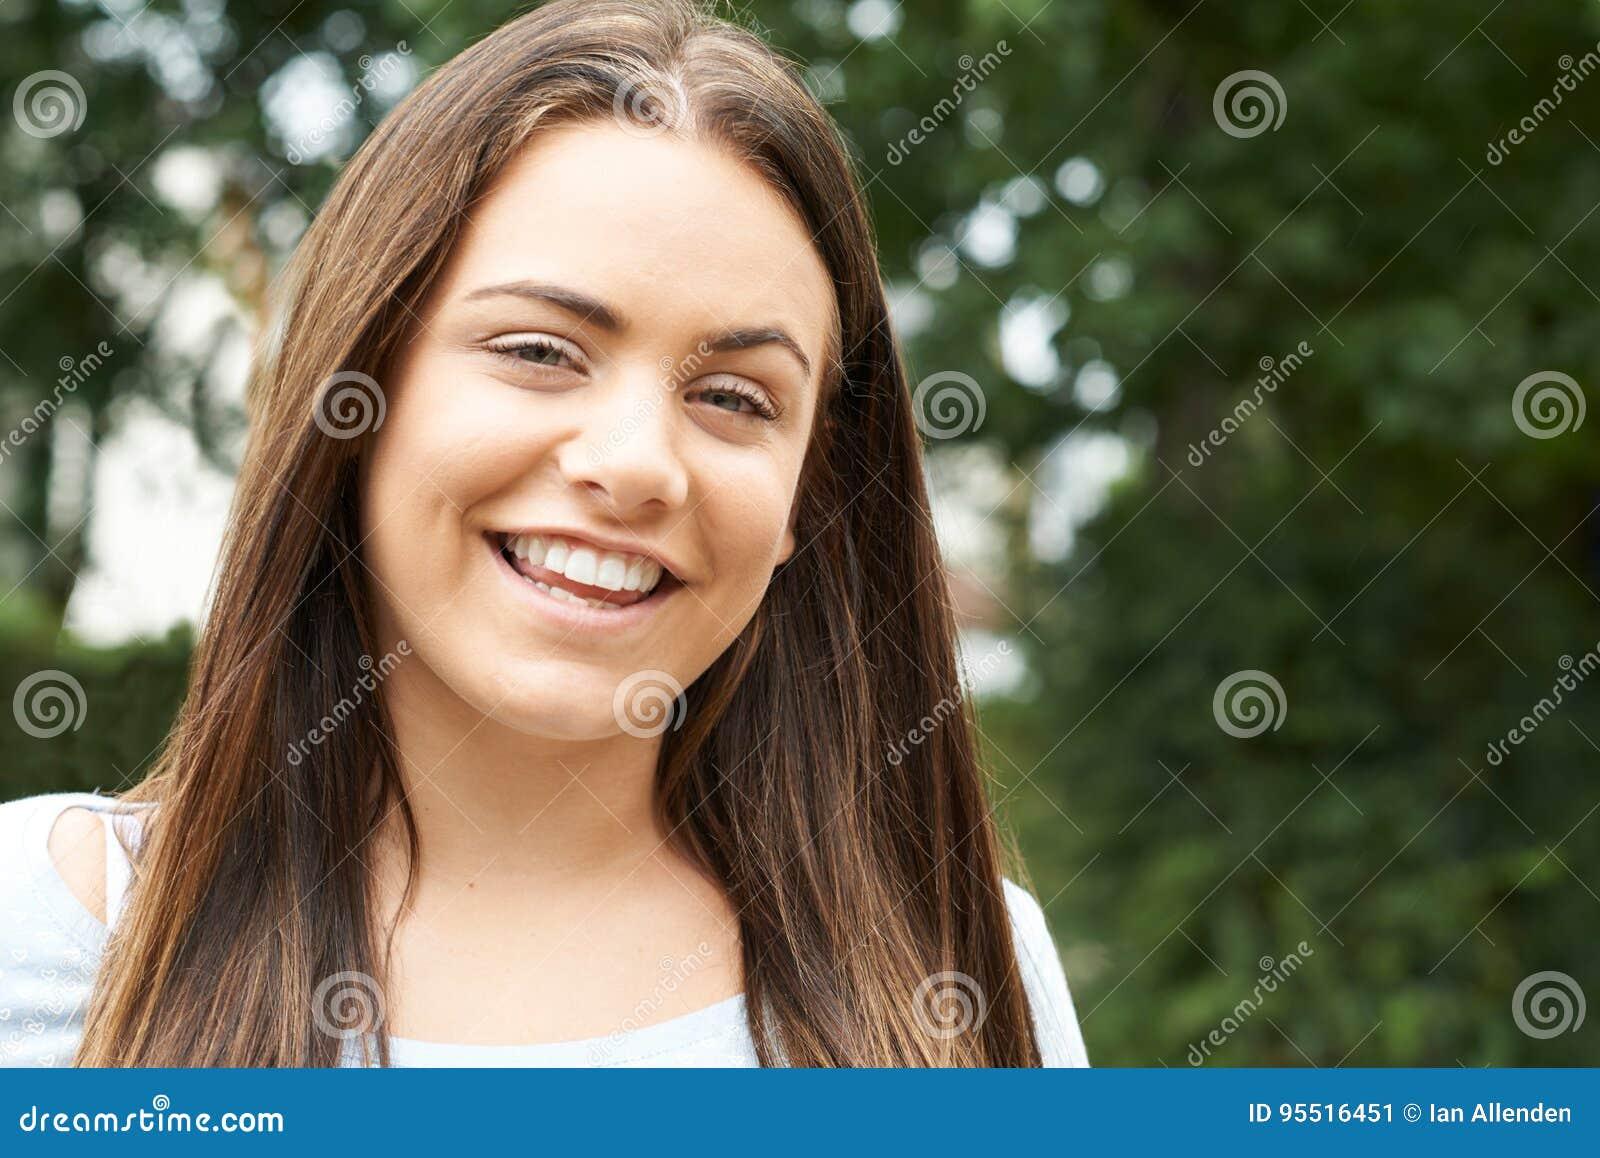 Openluchthoofd en Schoudersportret van Glimlachende Tiener